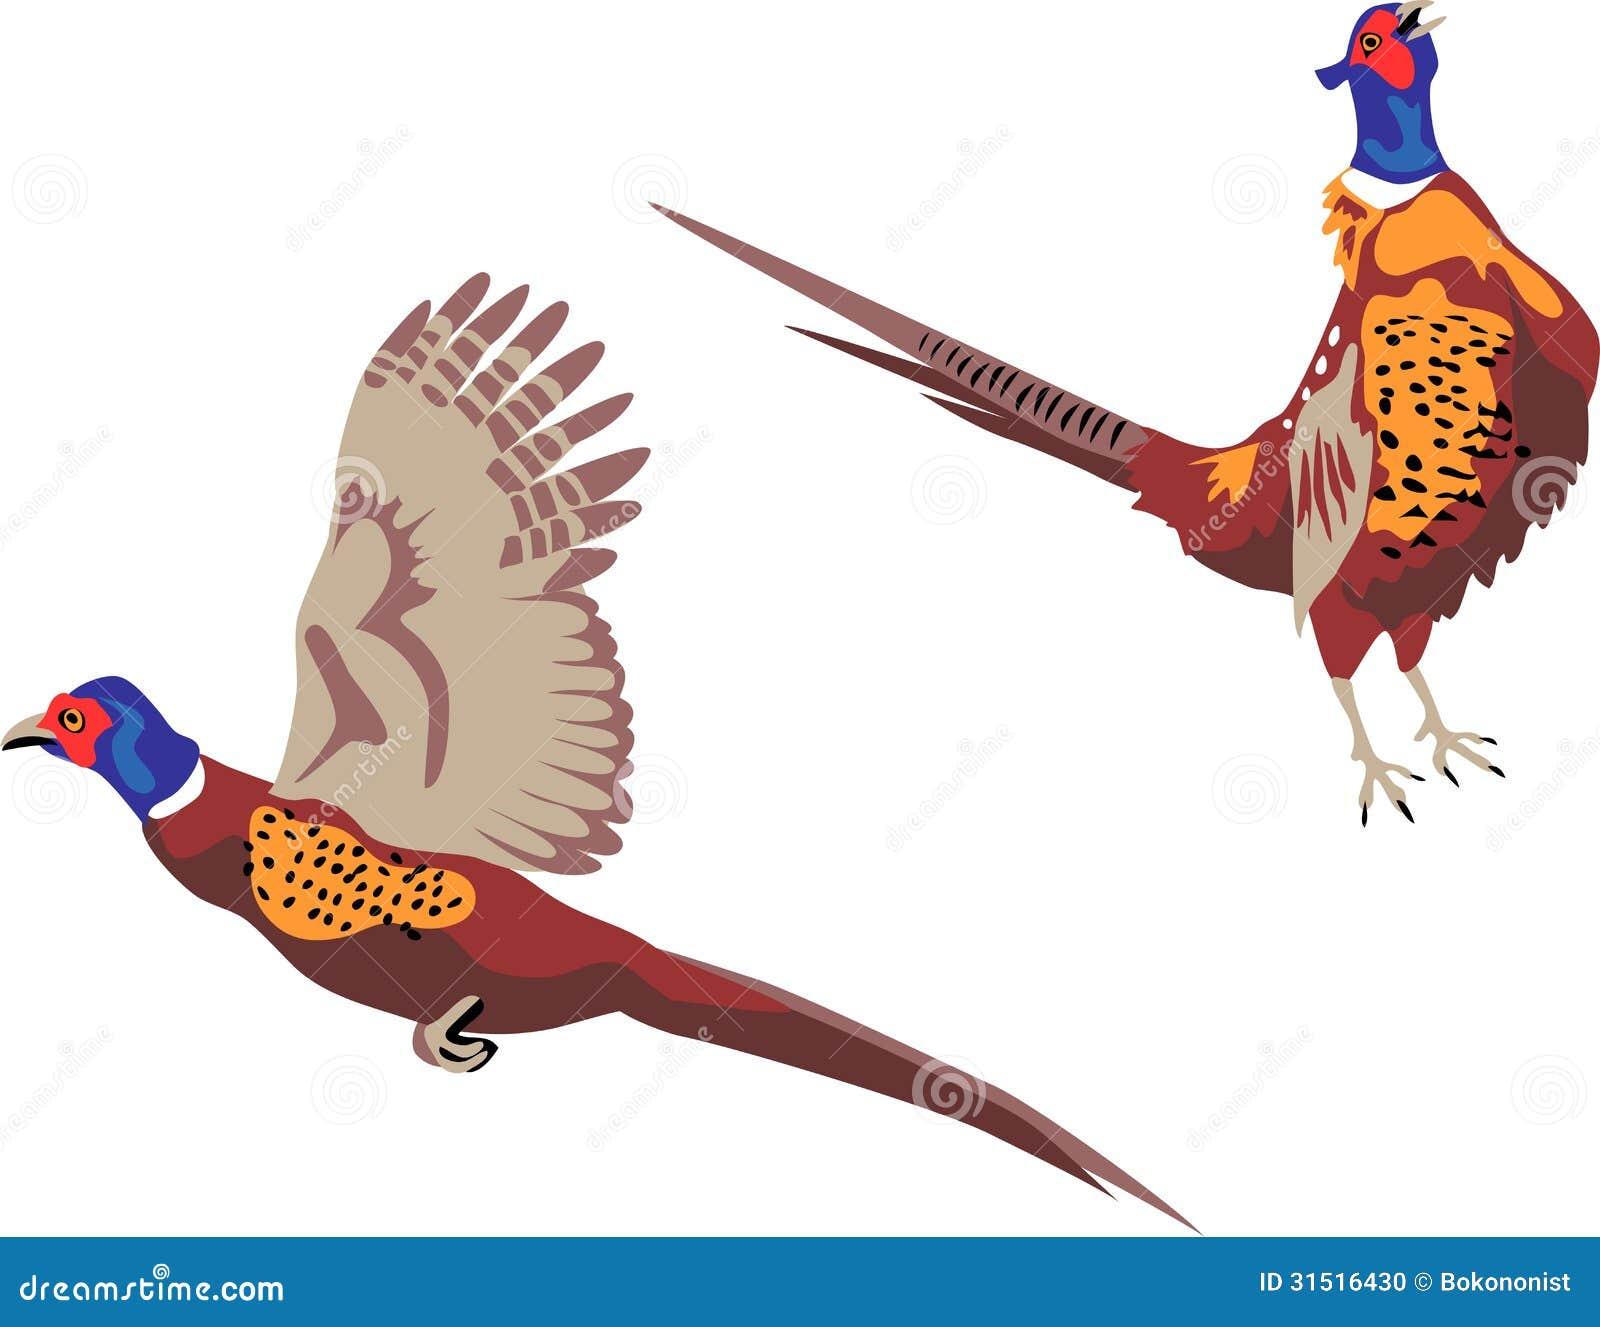 Pheasant Stock Illustrations  1197 Pheasant Stock